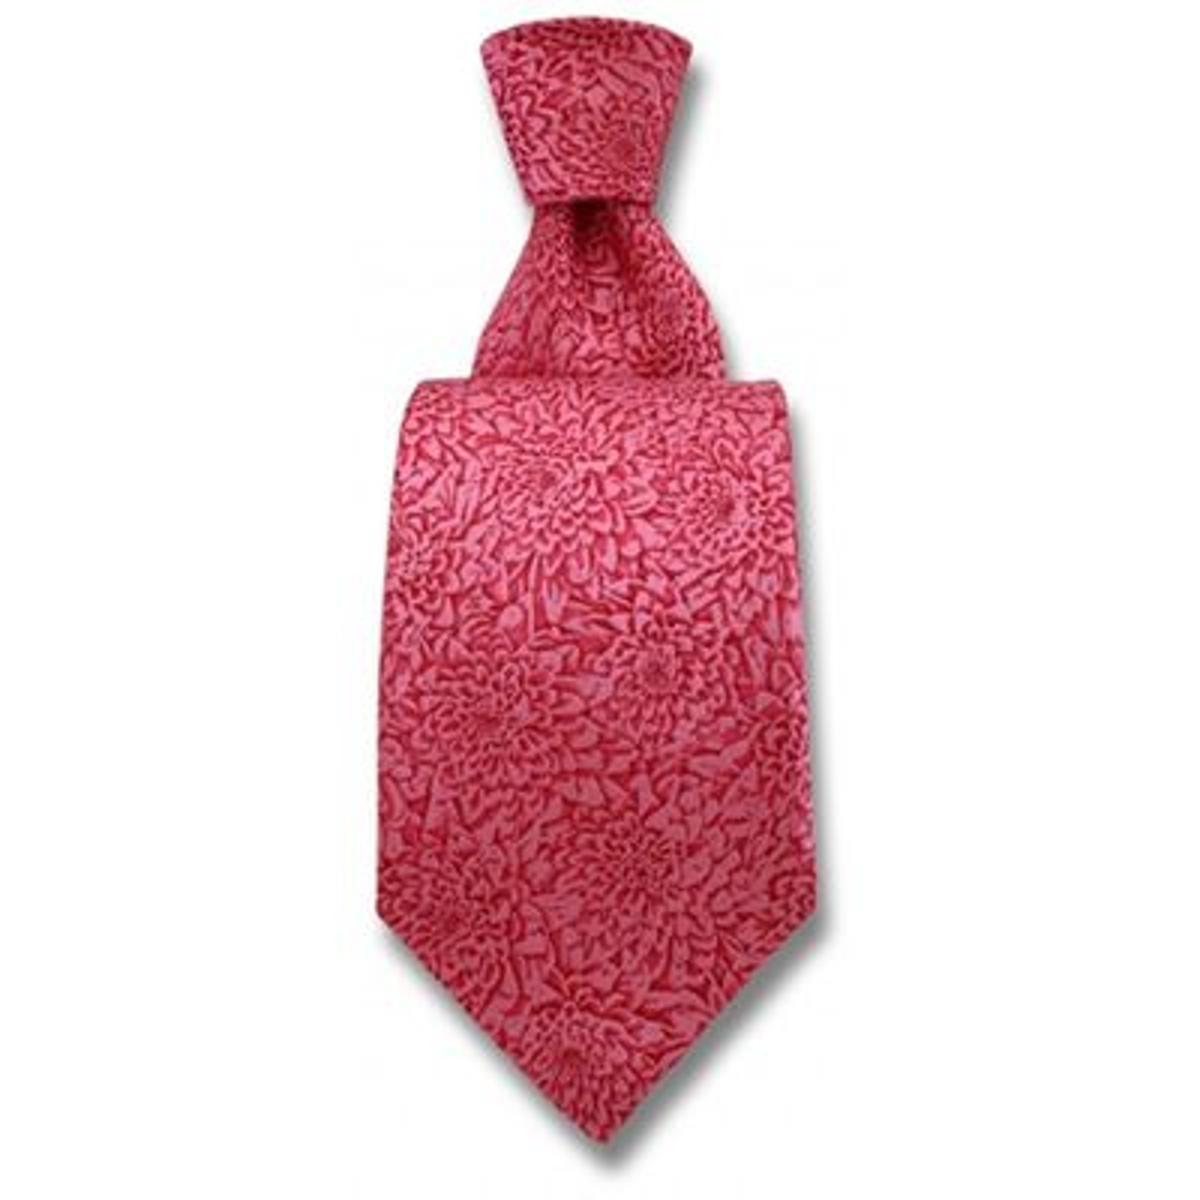 Cravate Robert Charles Chrysanthèmes Roses